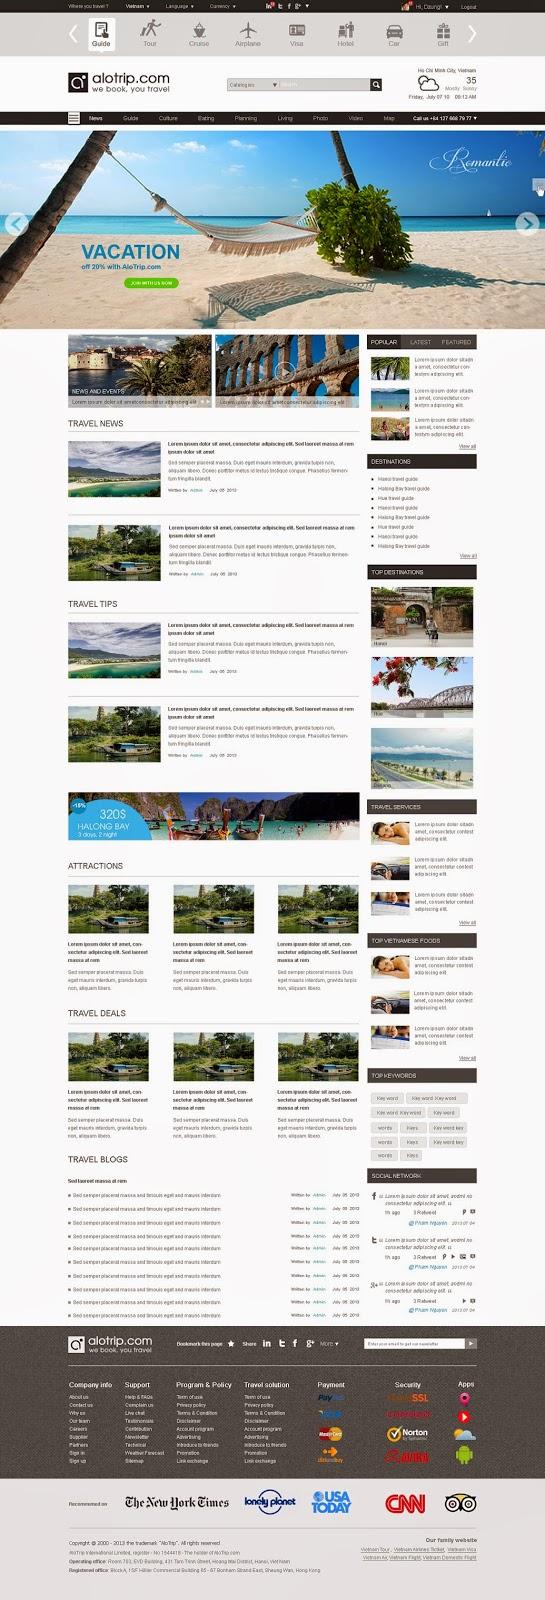 thiết kế website du lịch alotrip